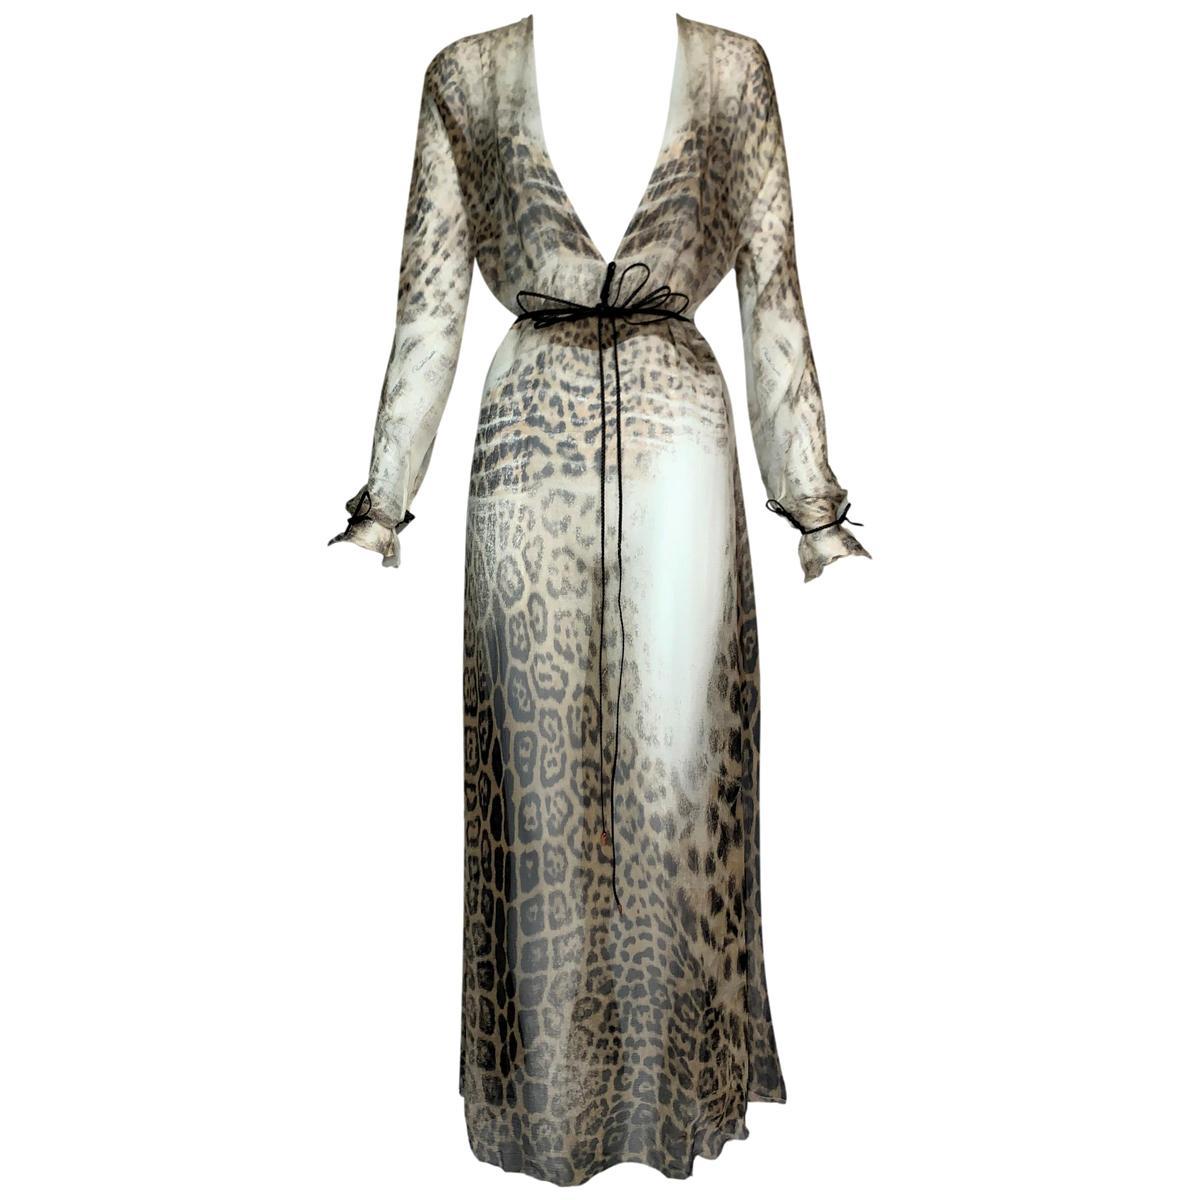 S/S 2002 Roberto Cavalli Sheer Leopard Silk Plunging High Slit Maxi Dress